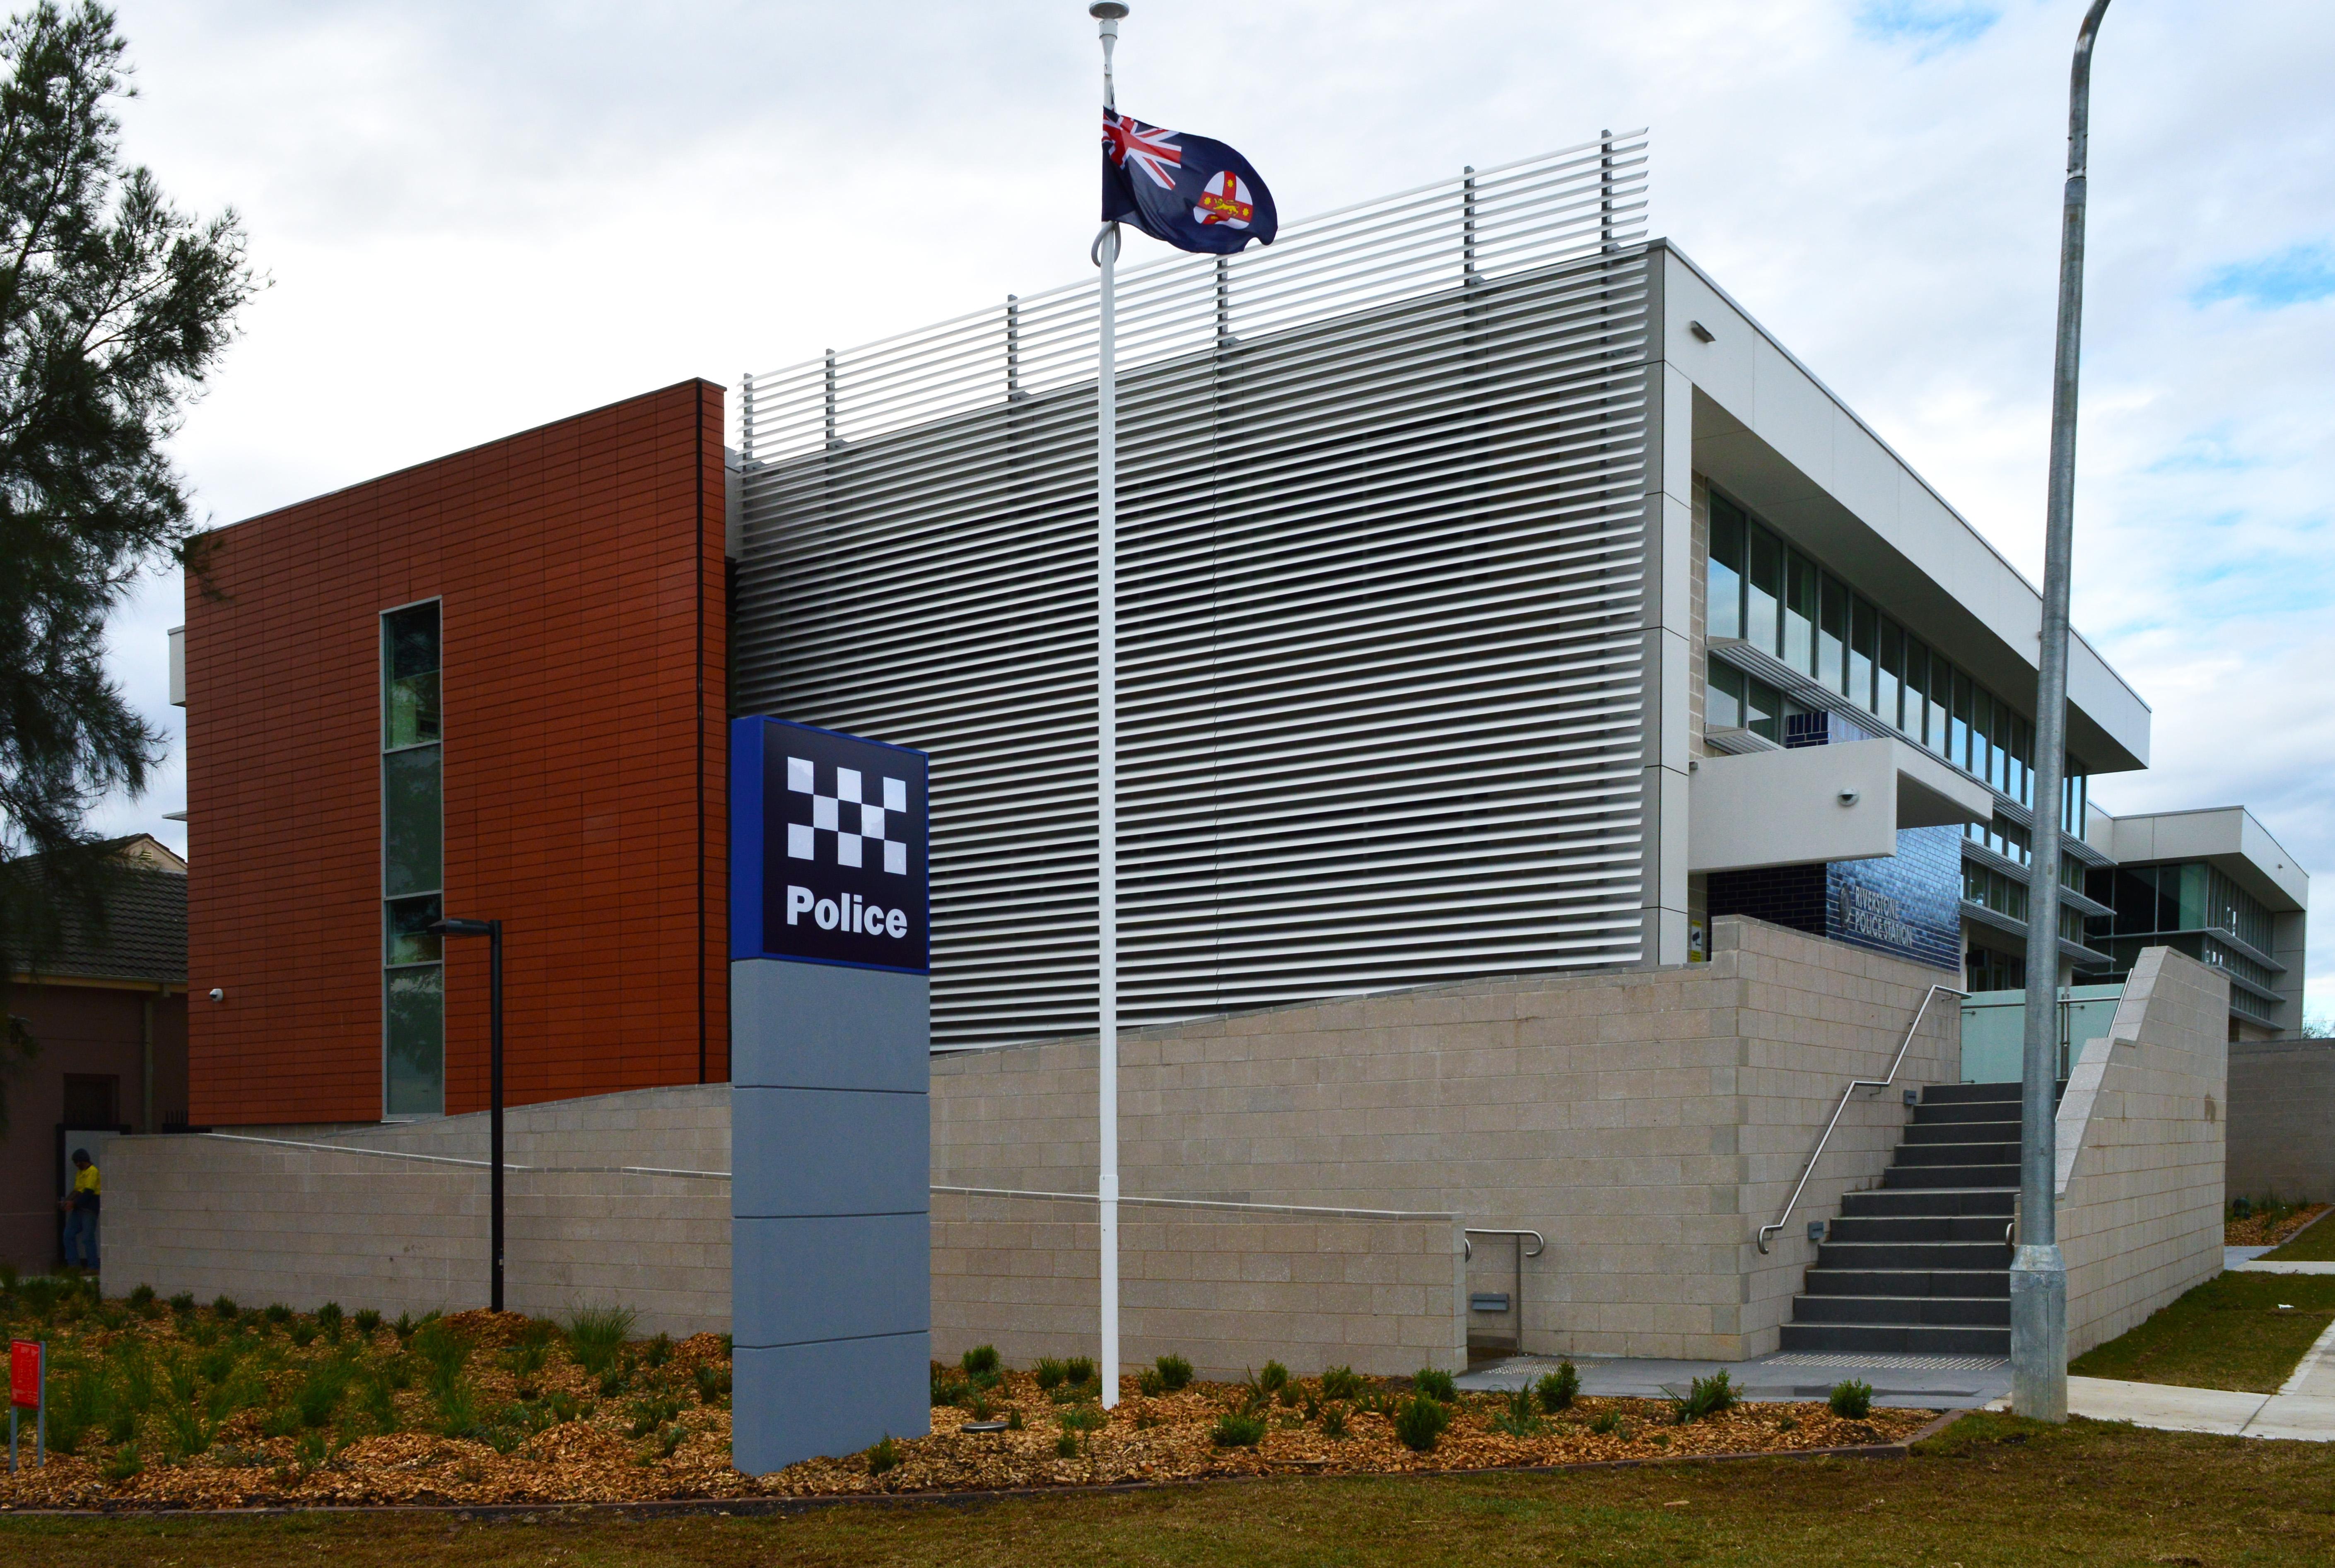 RIVERSTONE POLICE STATION